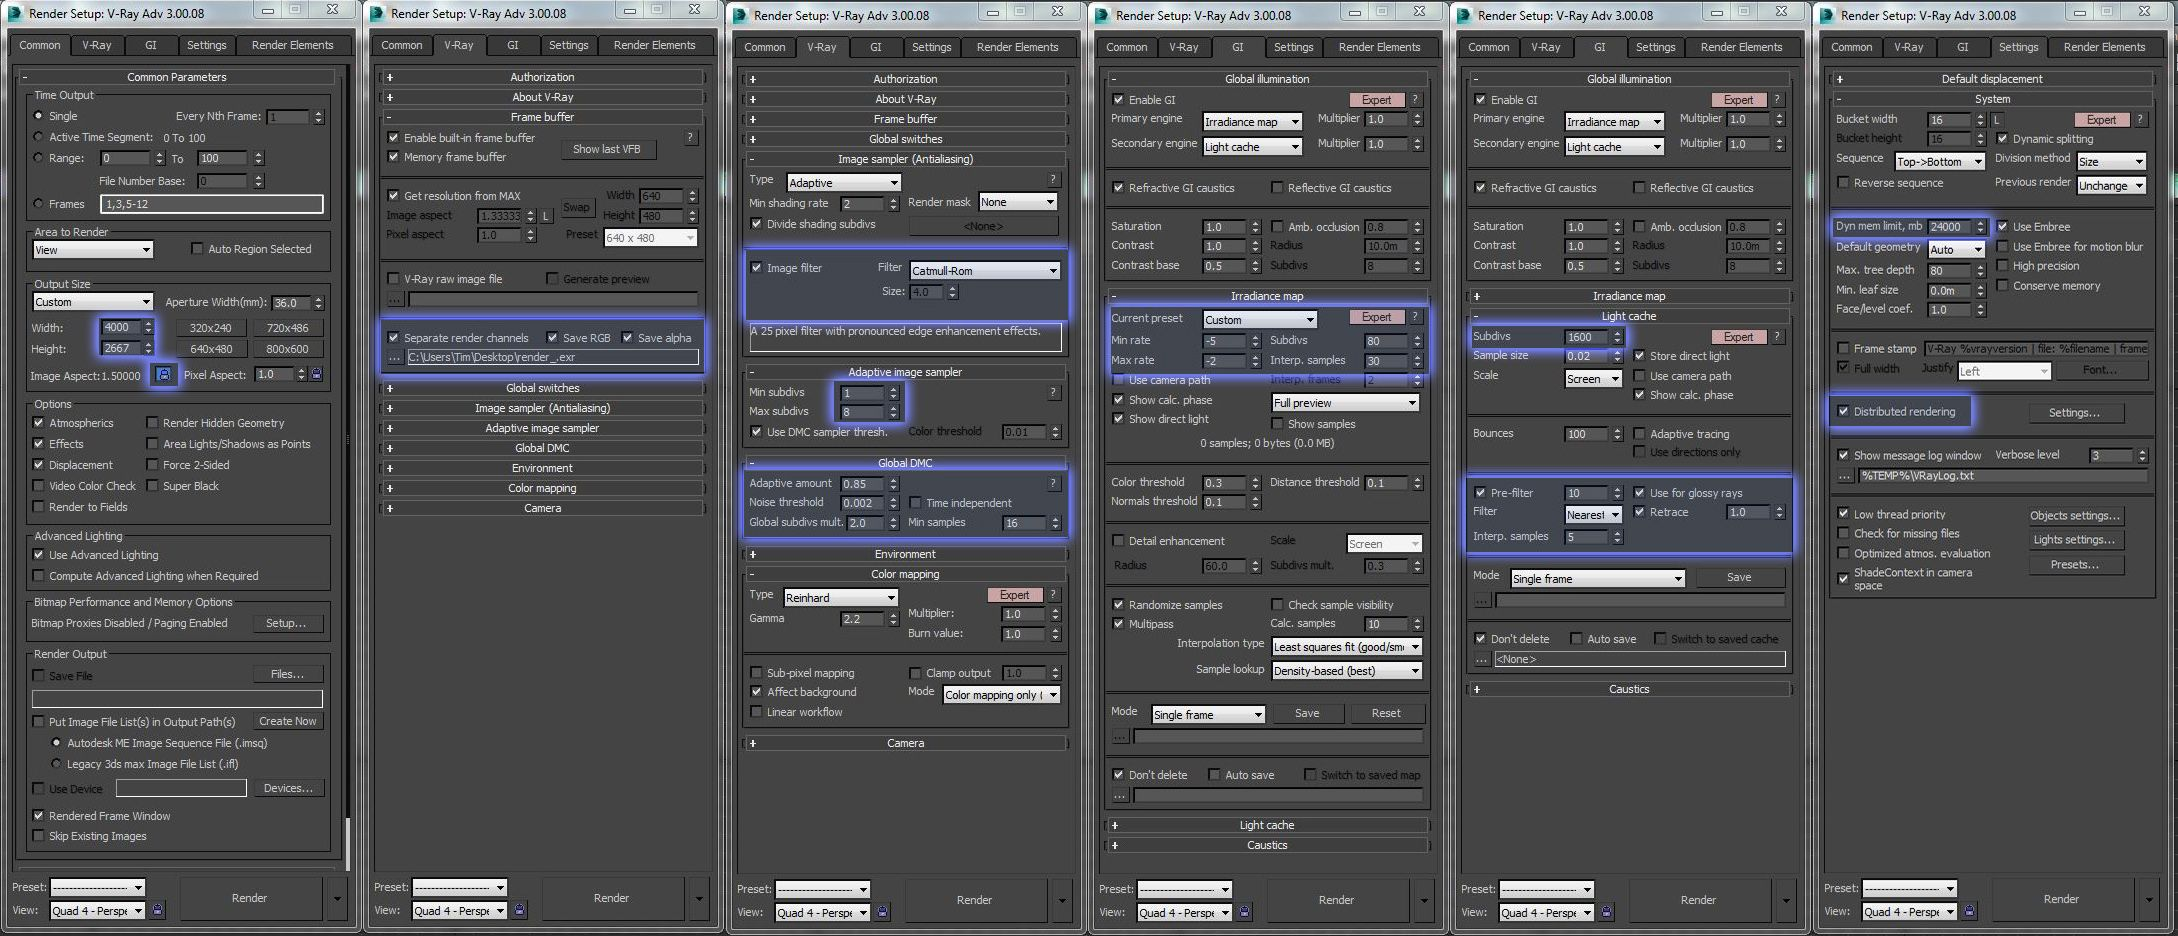 Draft presentation settings vray 3ds max desktop - Vray exterior rendering settings pdf ...